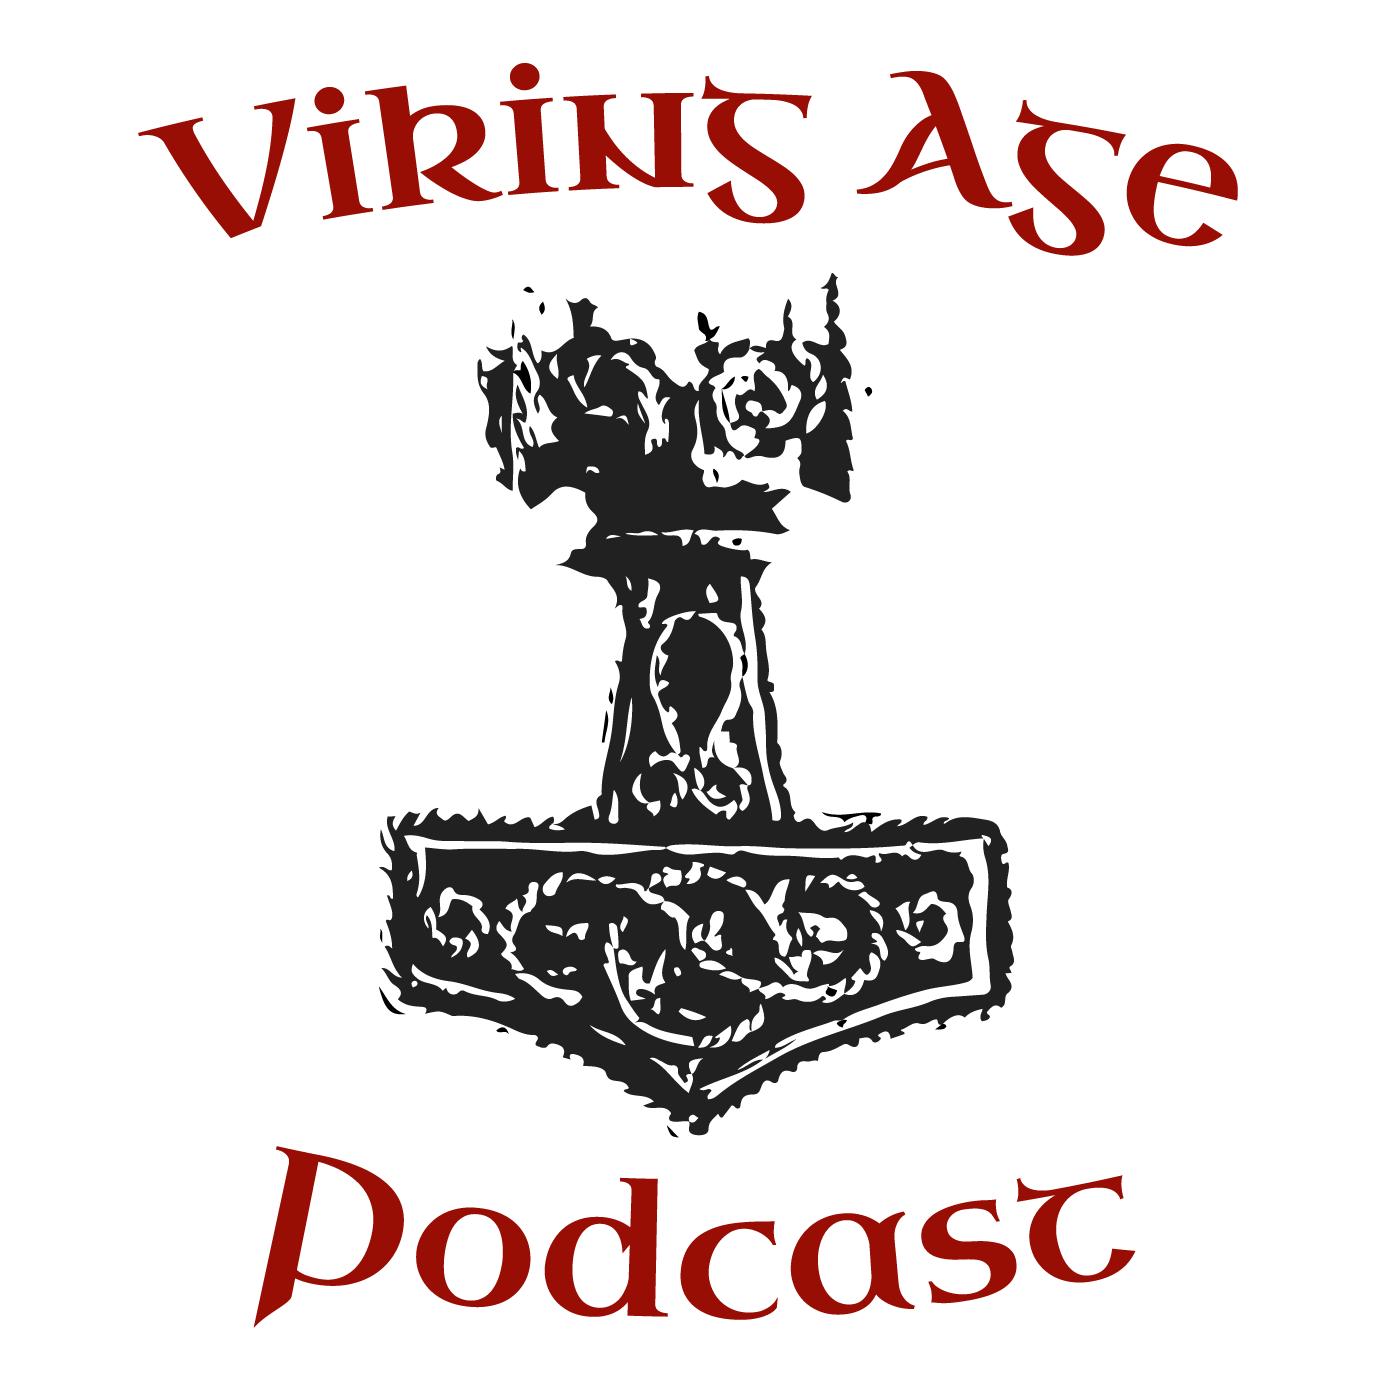 Viking Age Podcast show art